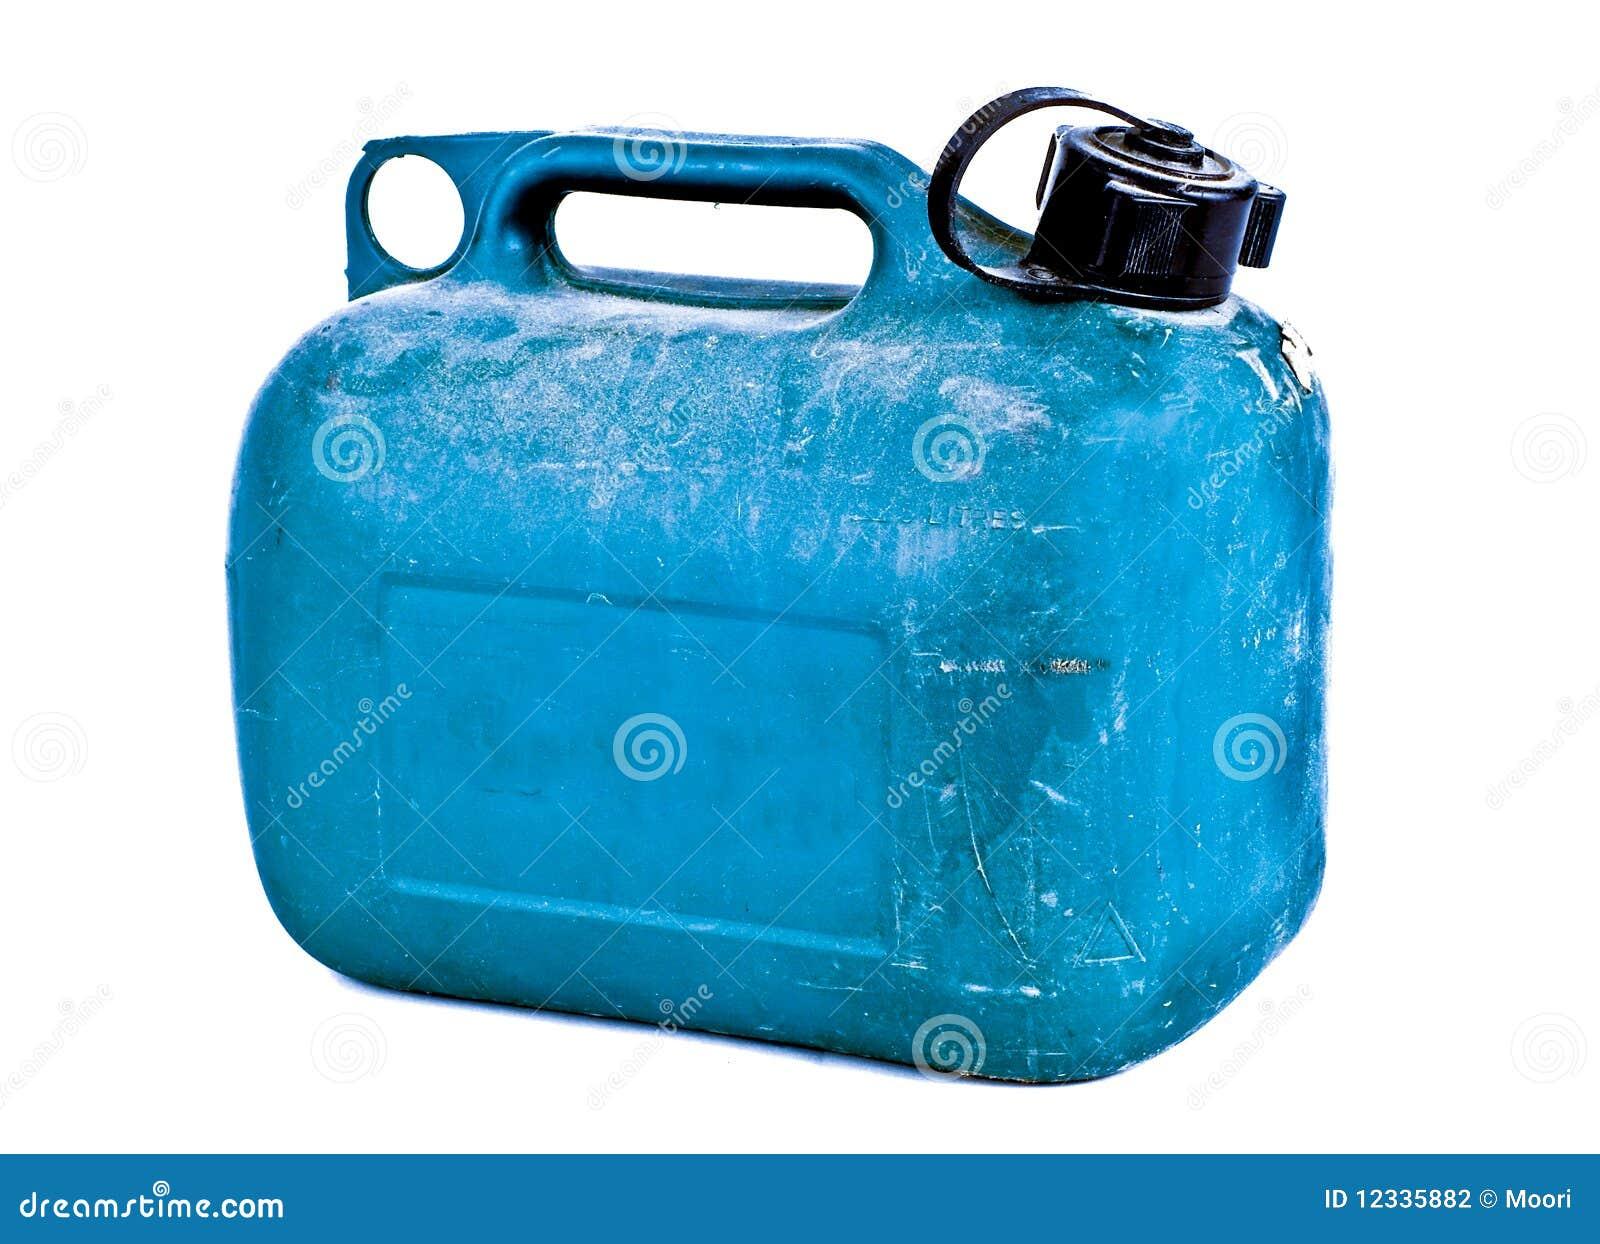 Bluen kan gas plast-